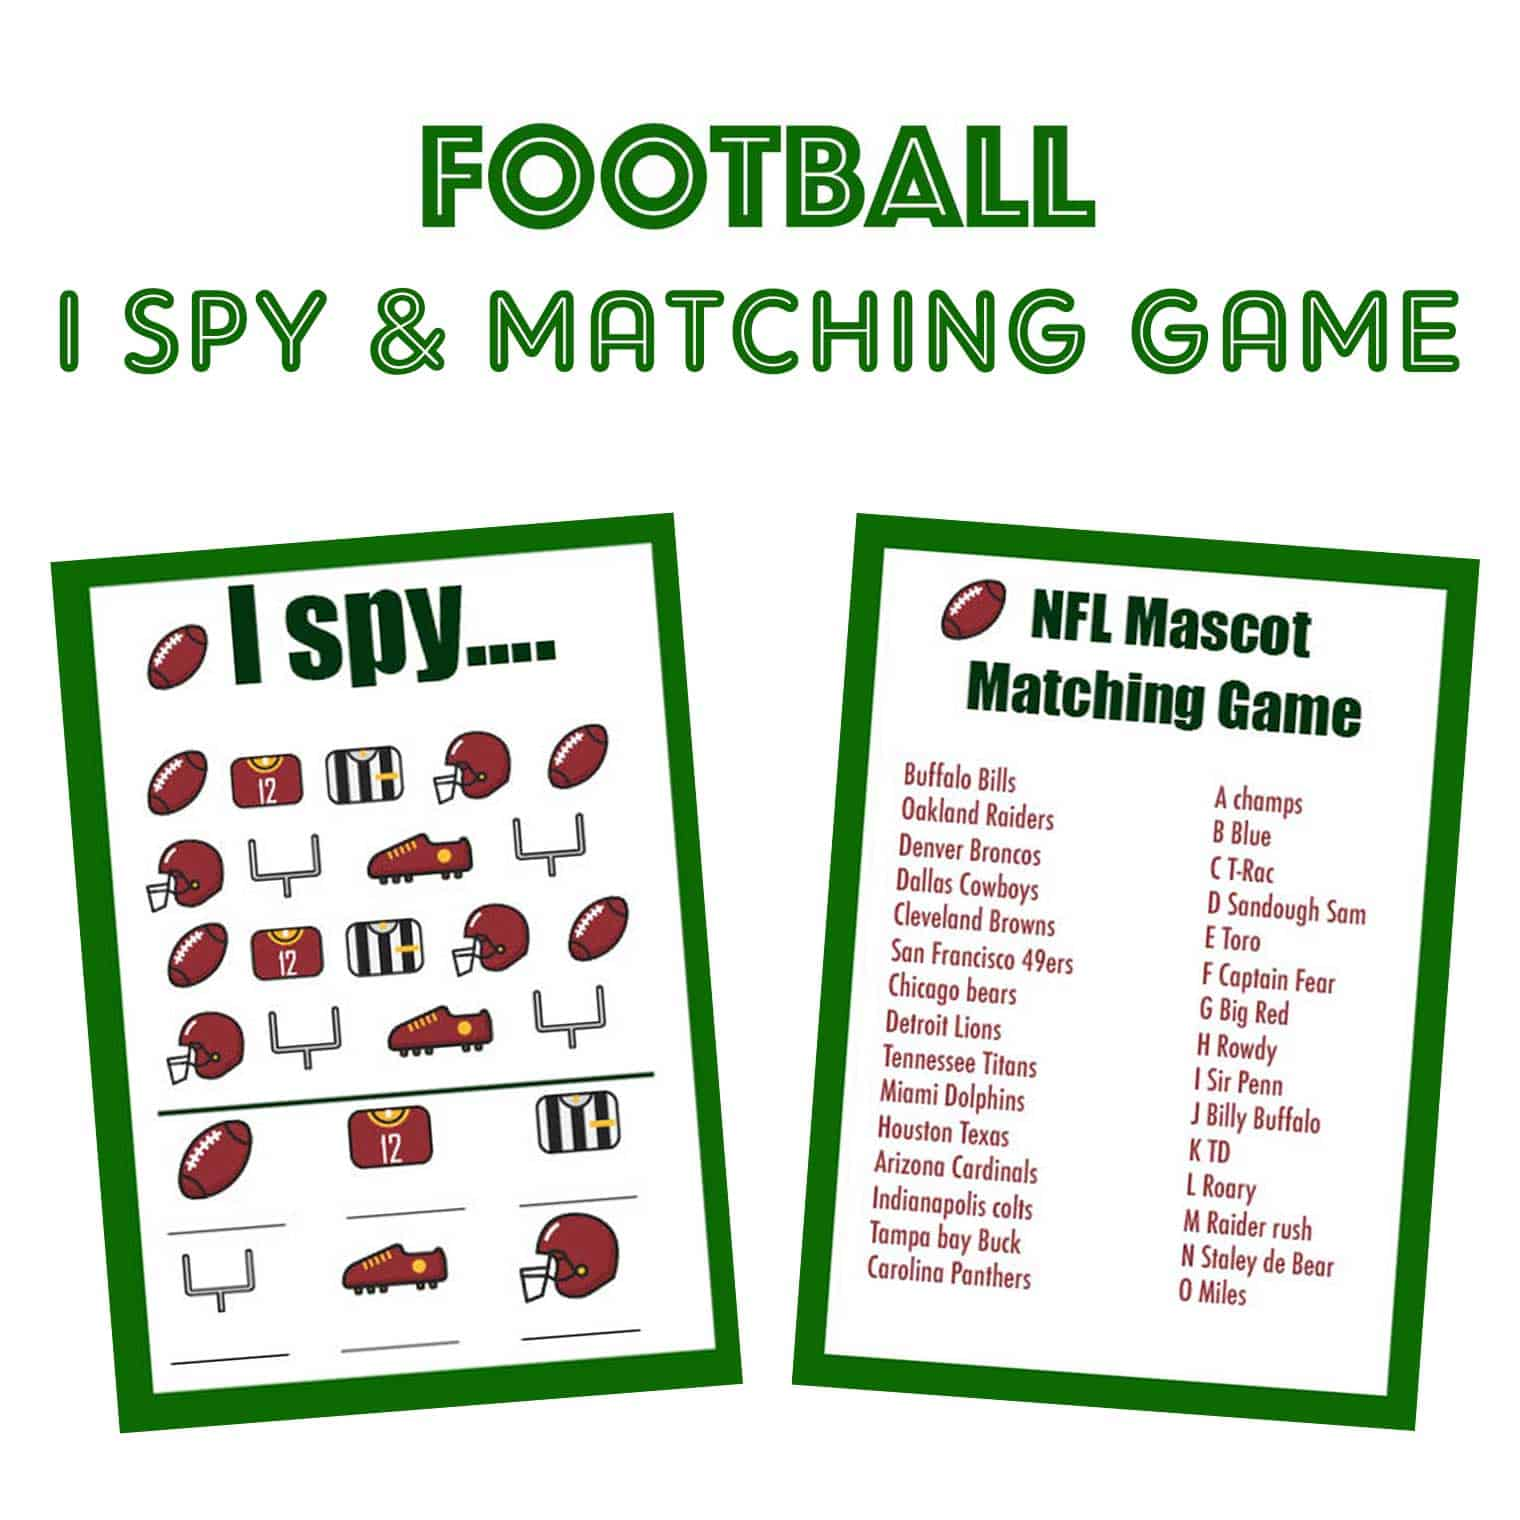 Football I Spy and NHL Mascot Matching Game